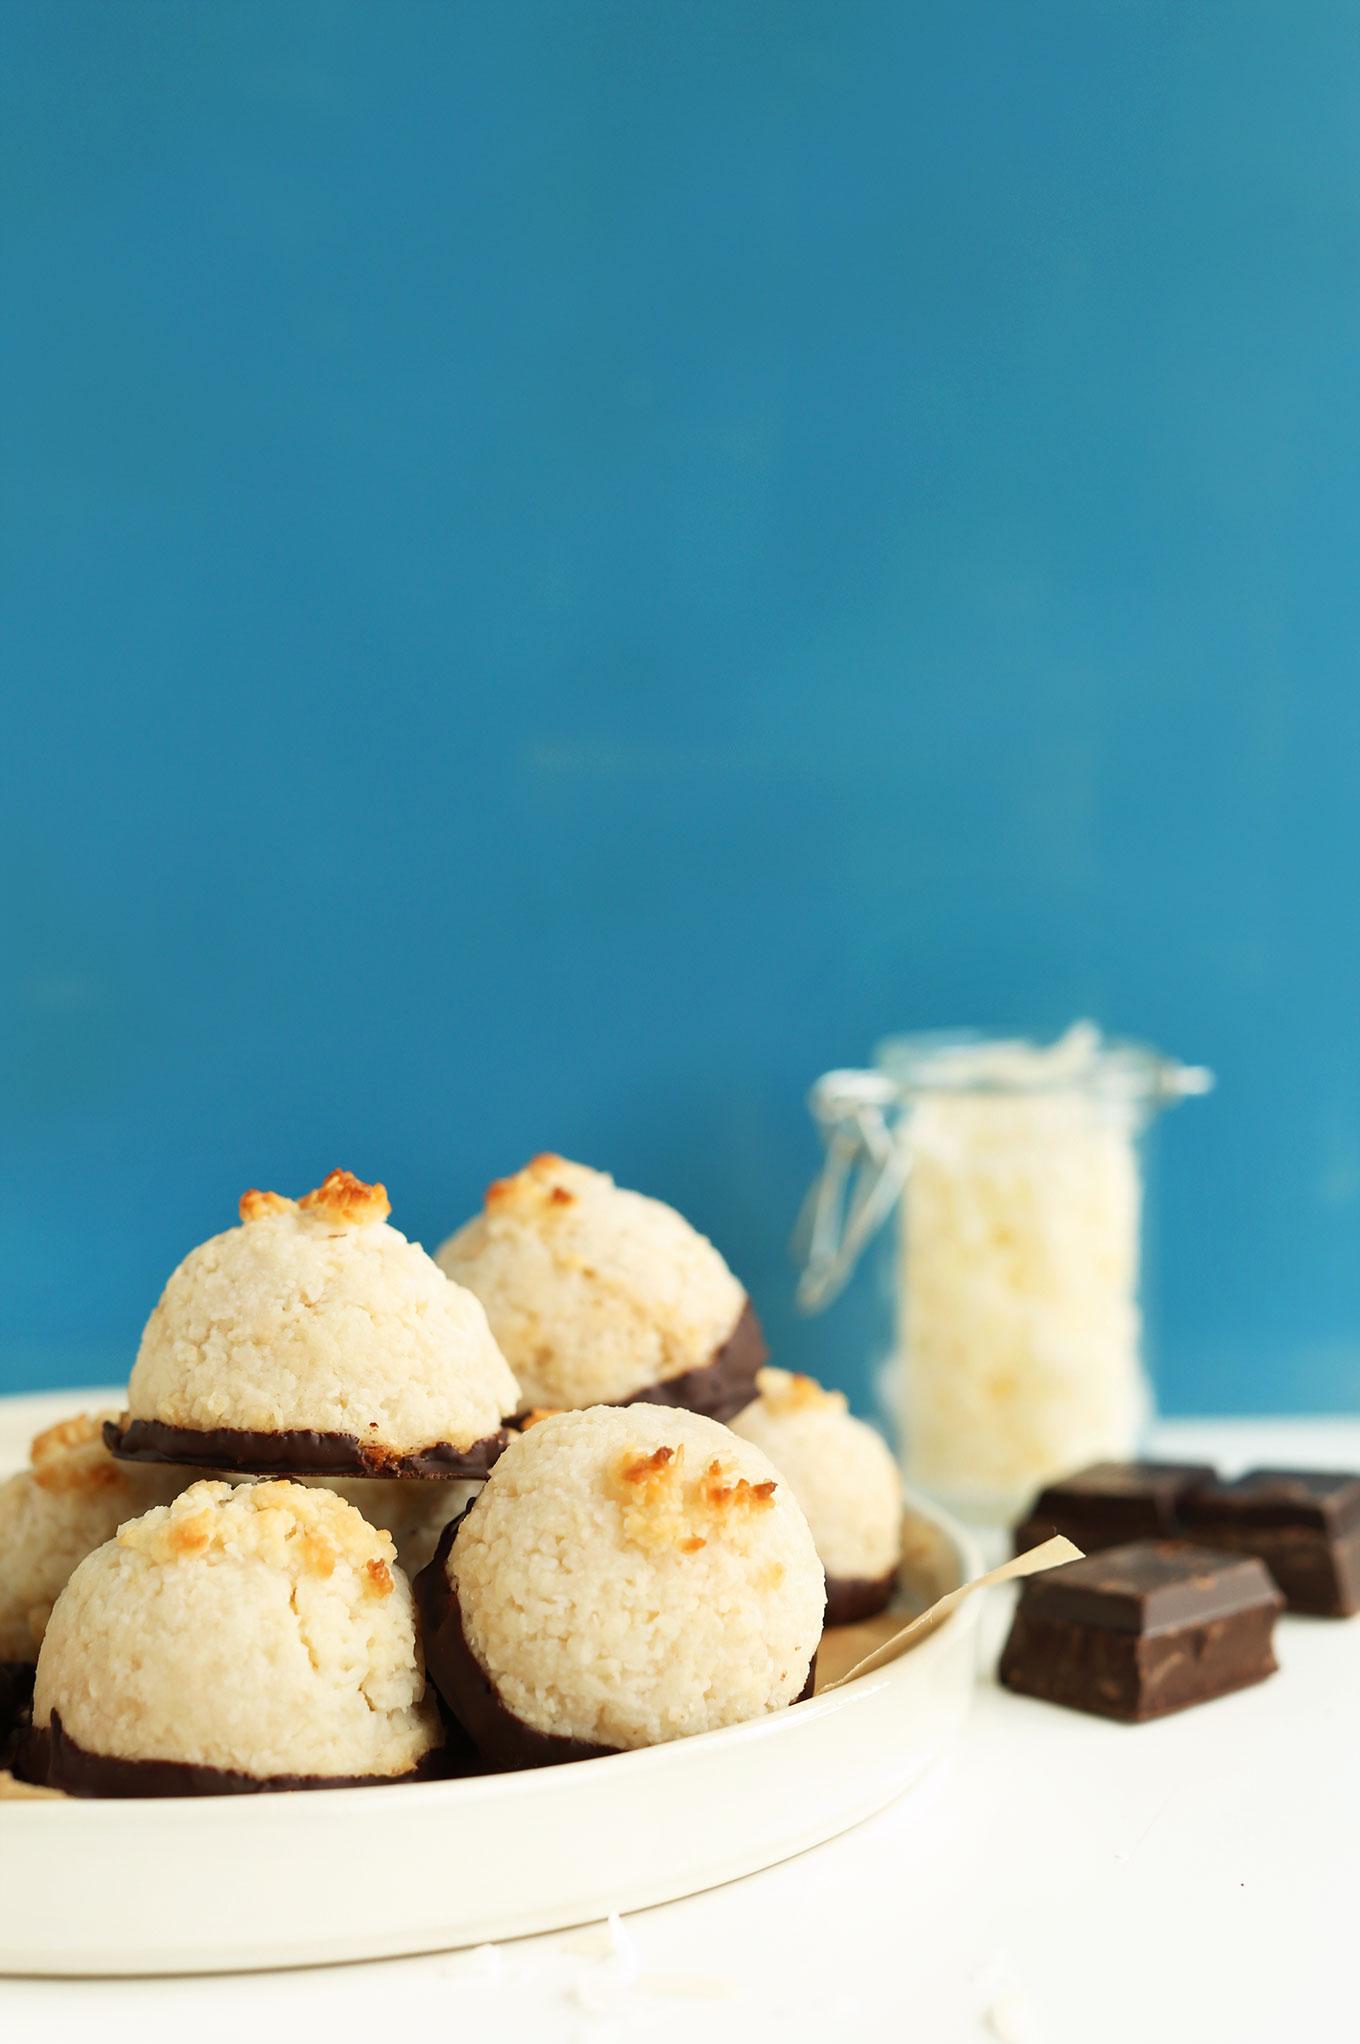 AMAZING 5-Ingredient Coconut Macaroons dipped in Dark Chocolate! #vegan #glutenfree #macaroons #minimalistbaker